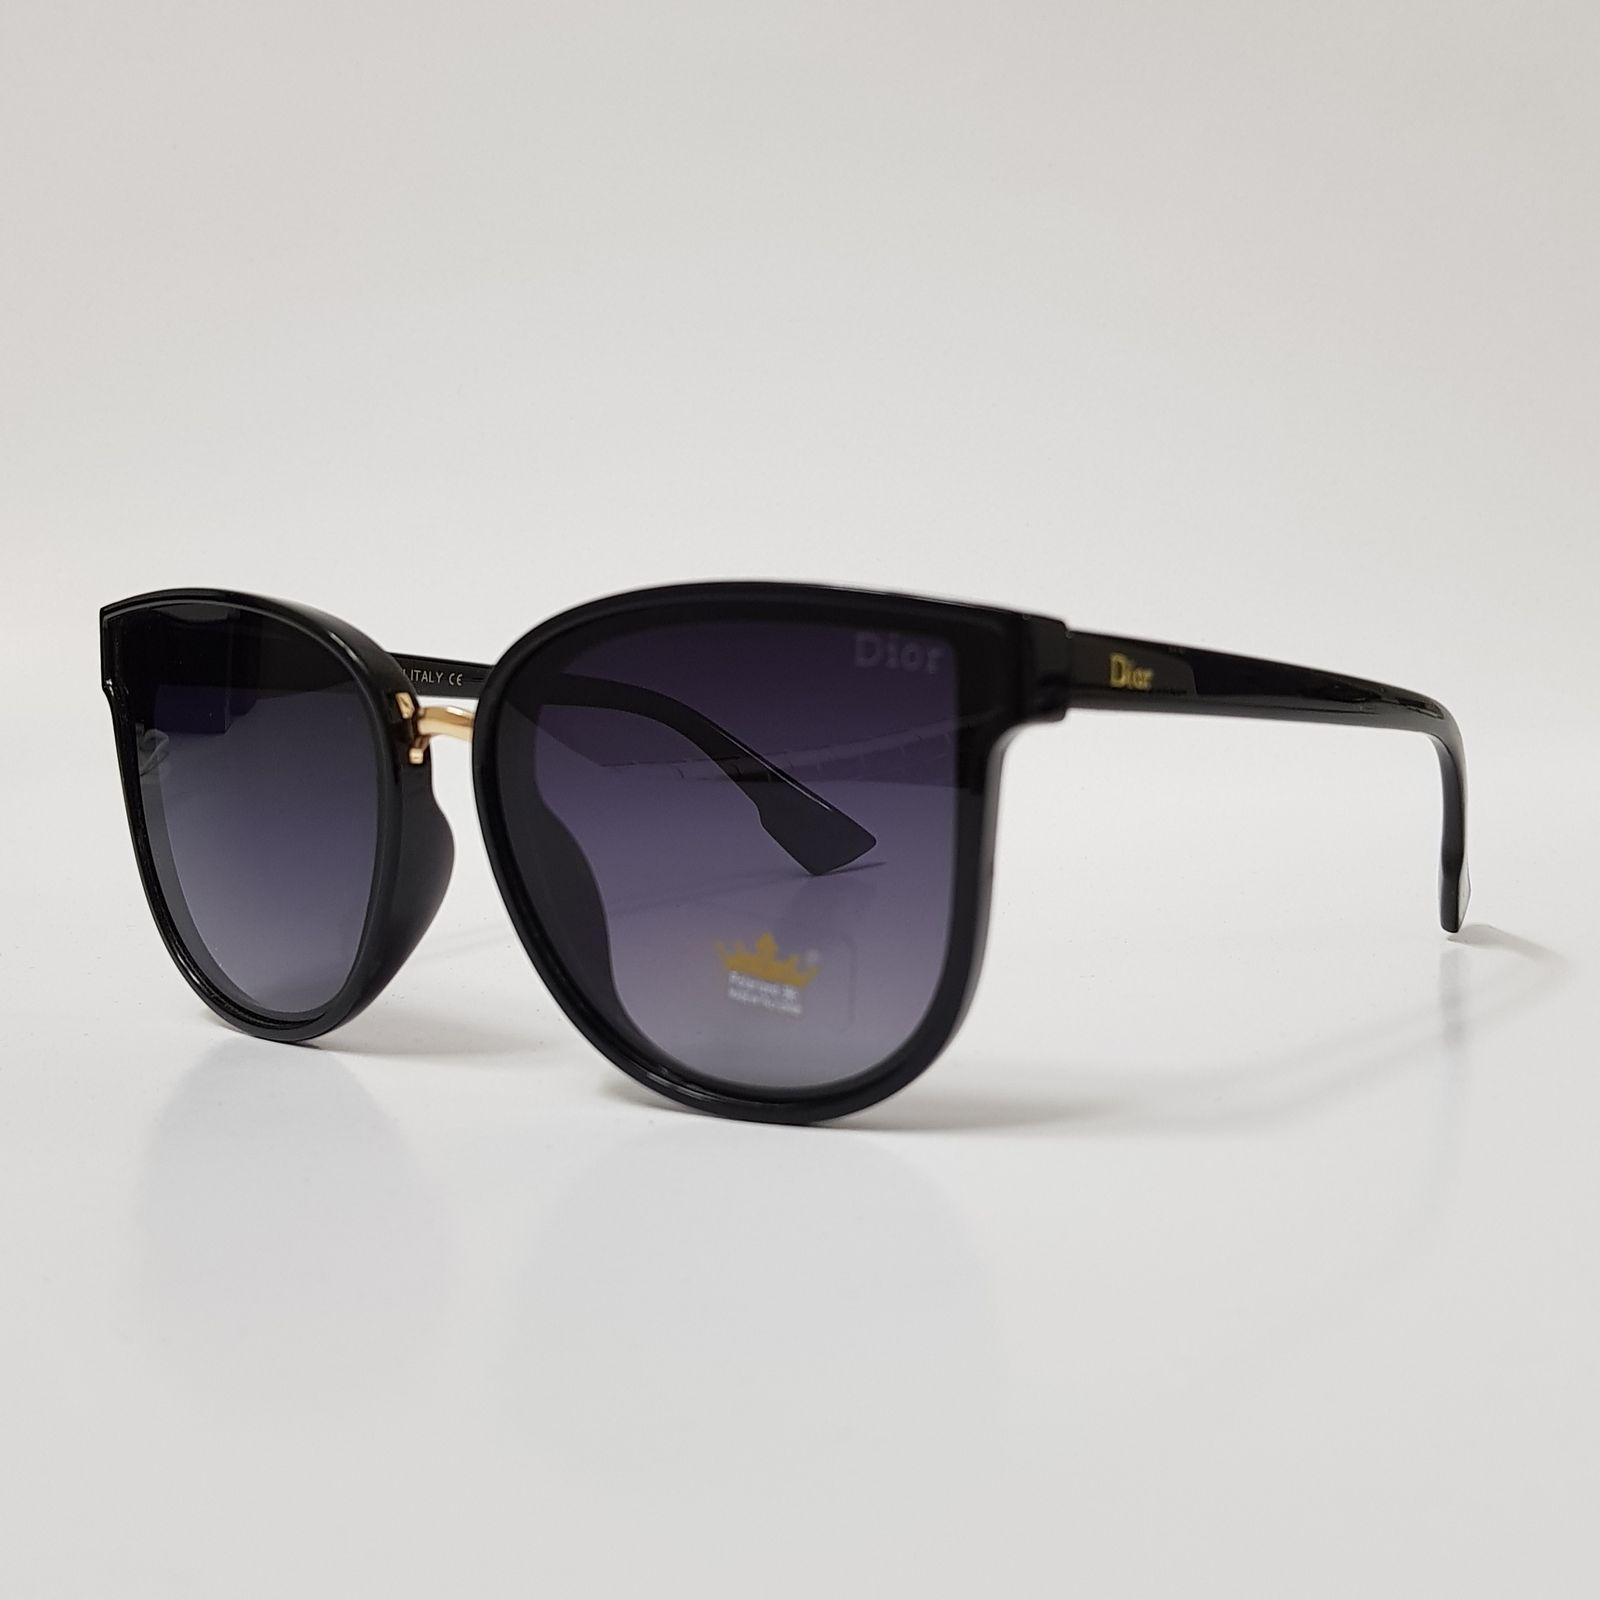 عینک آفتابی زنانه دیور کد 3030D1 main 1 3